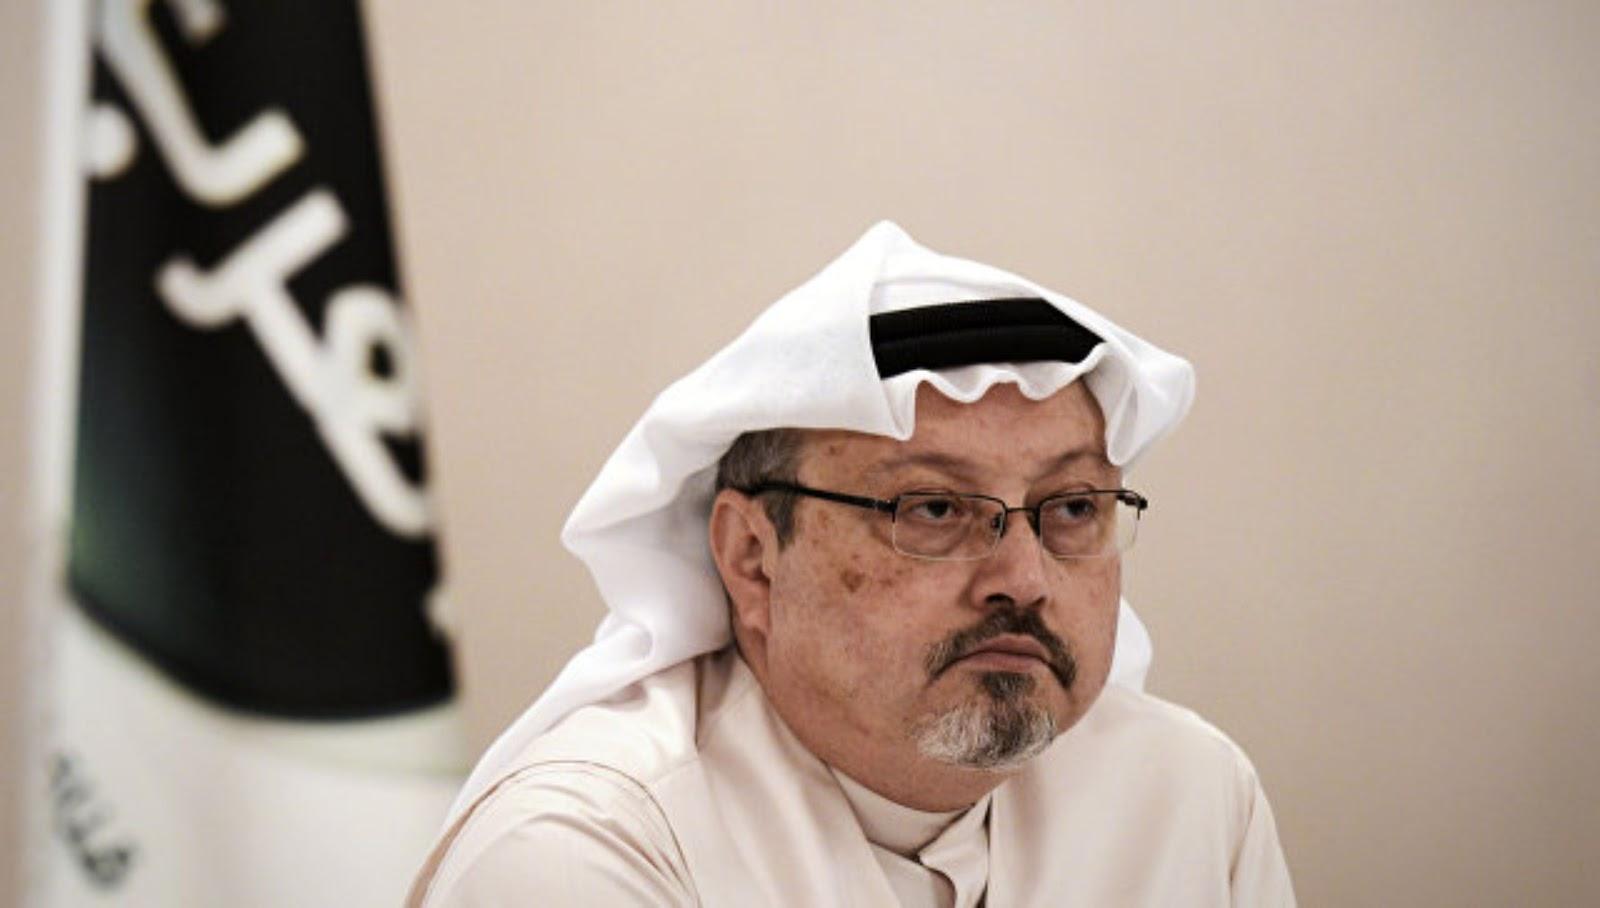 Khashoggi sedang mempersiapkan sebuah materi tentang penggunaan senjata kimia oleh Saudi di Yaman